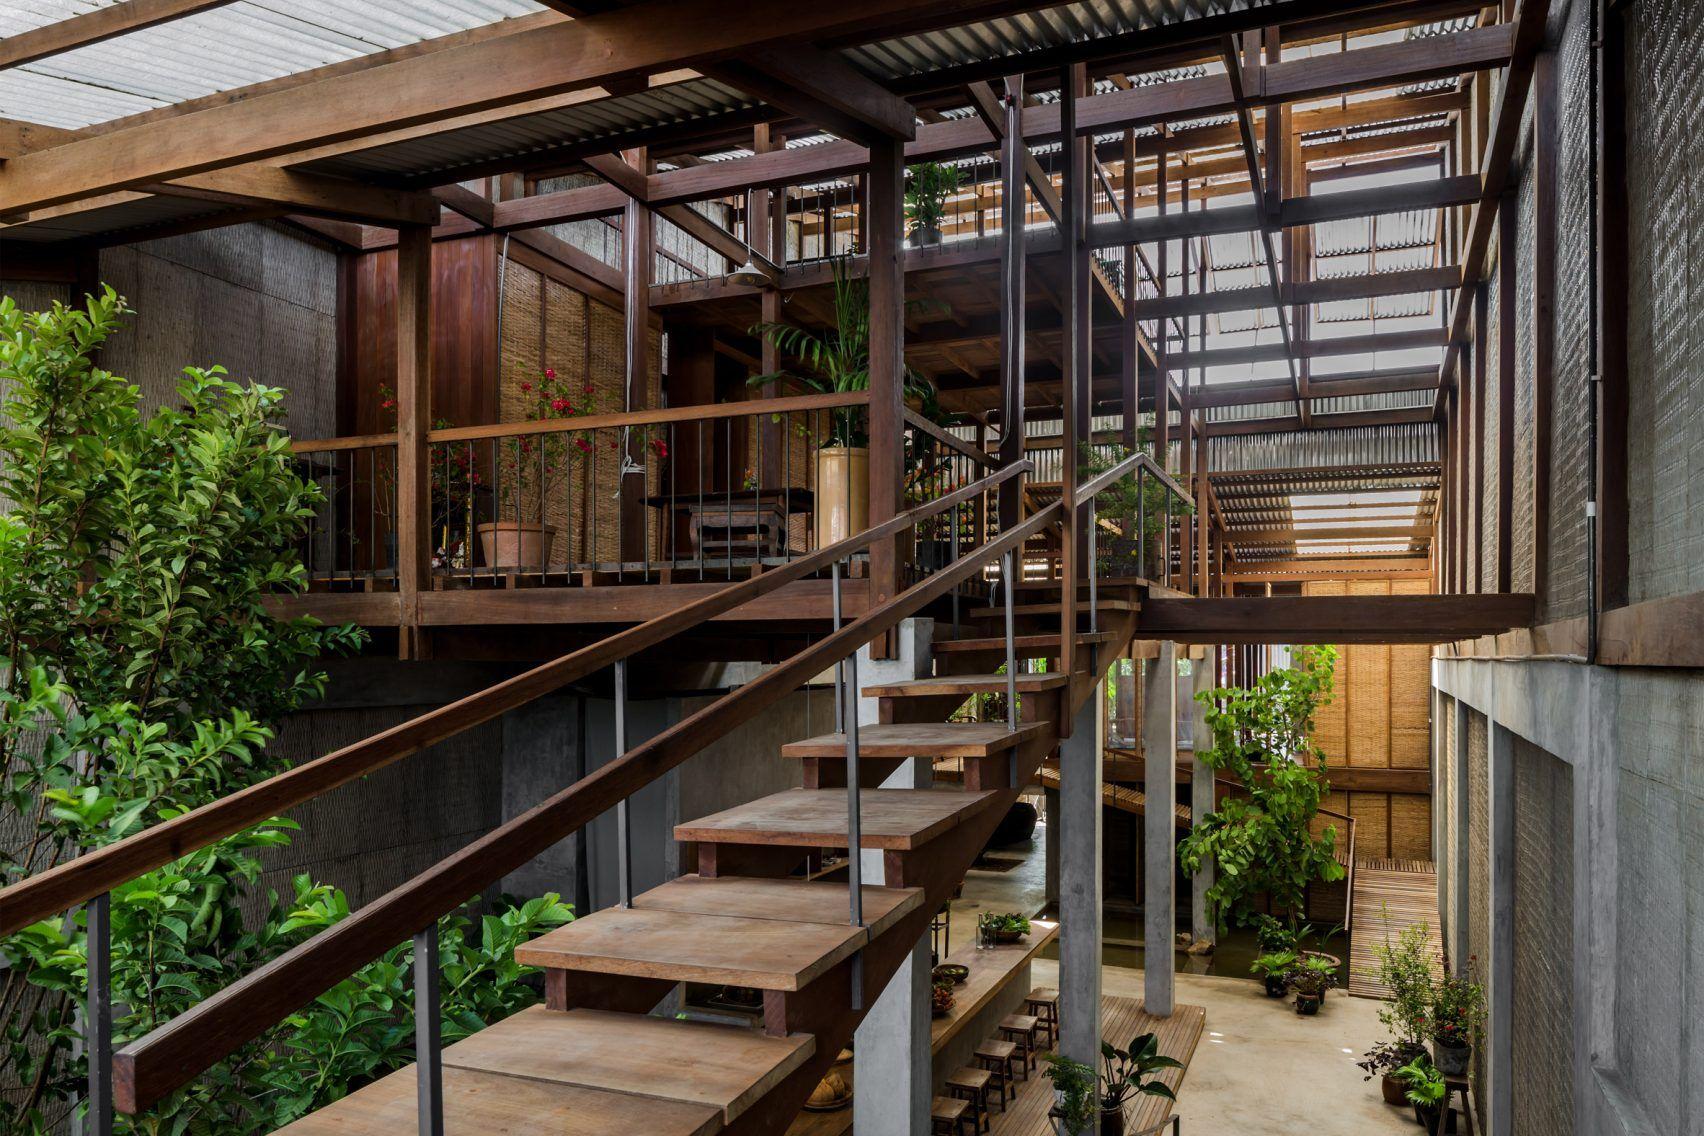 House Chau Doc Nishizawa Architects Architecture Residential Dezeen 2364 Col 2 1704x1136